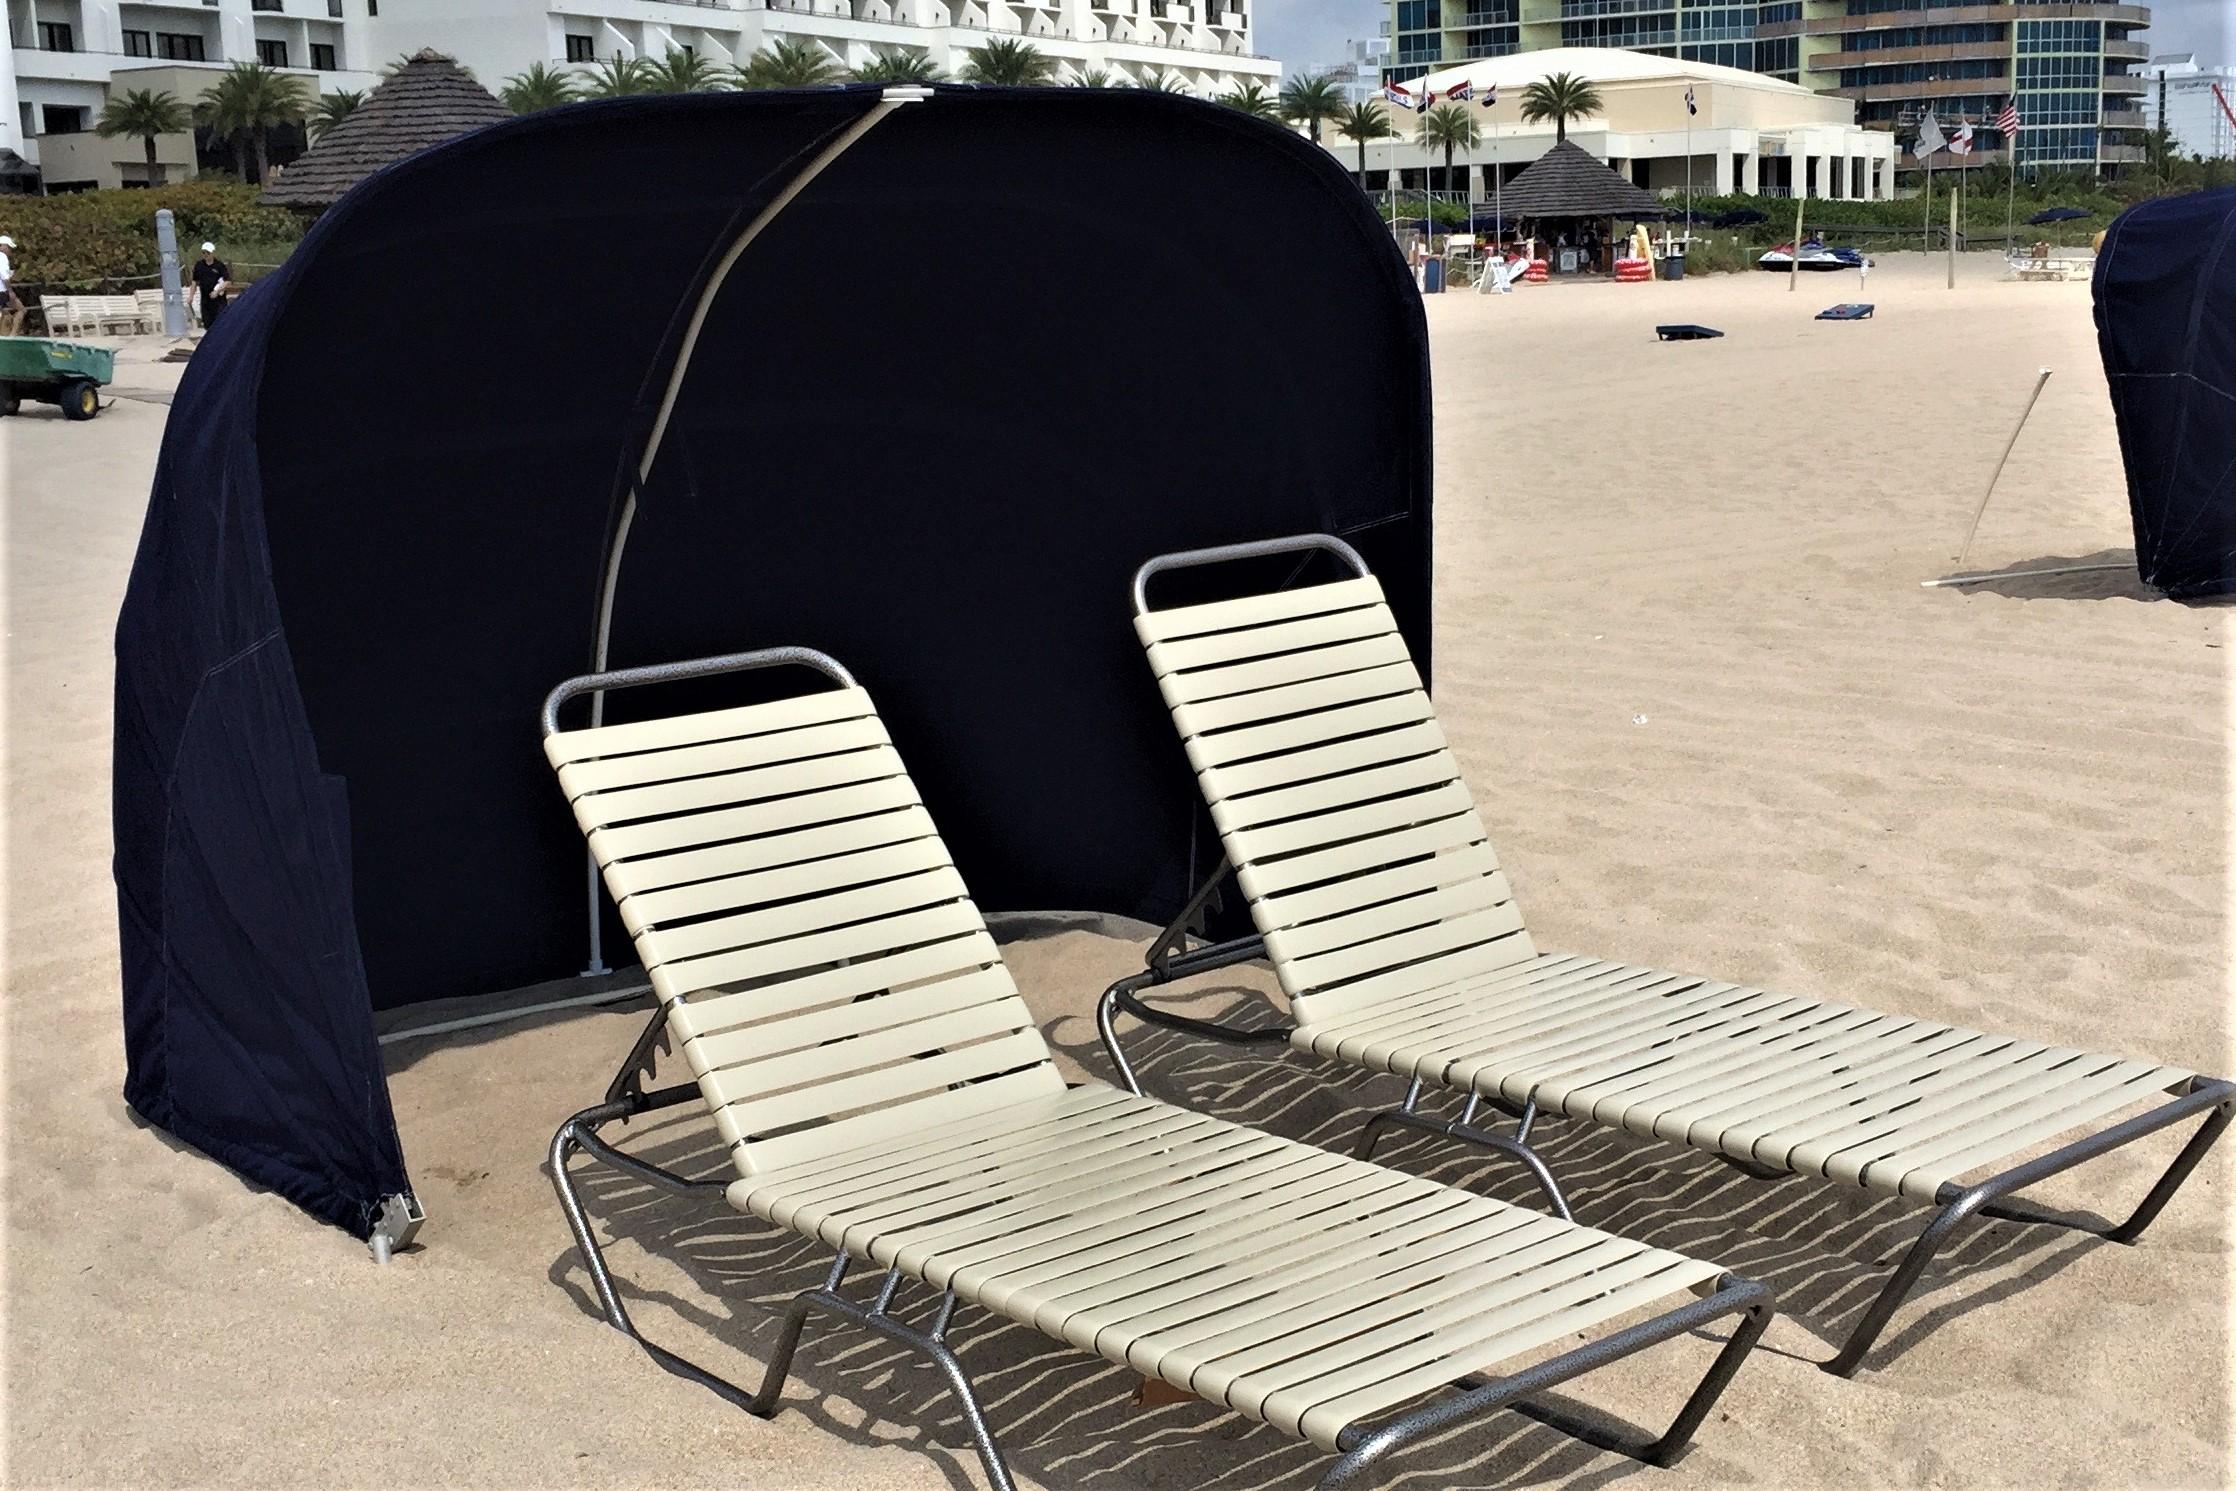 Black cabana on beach